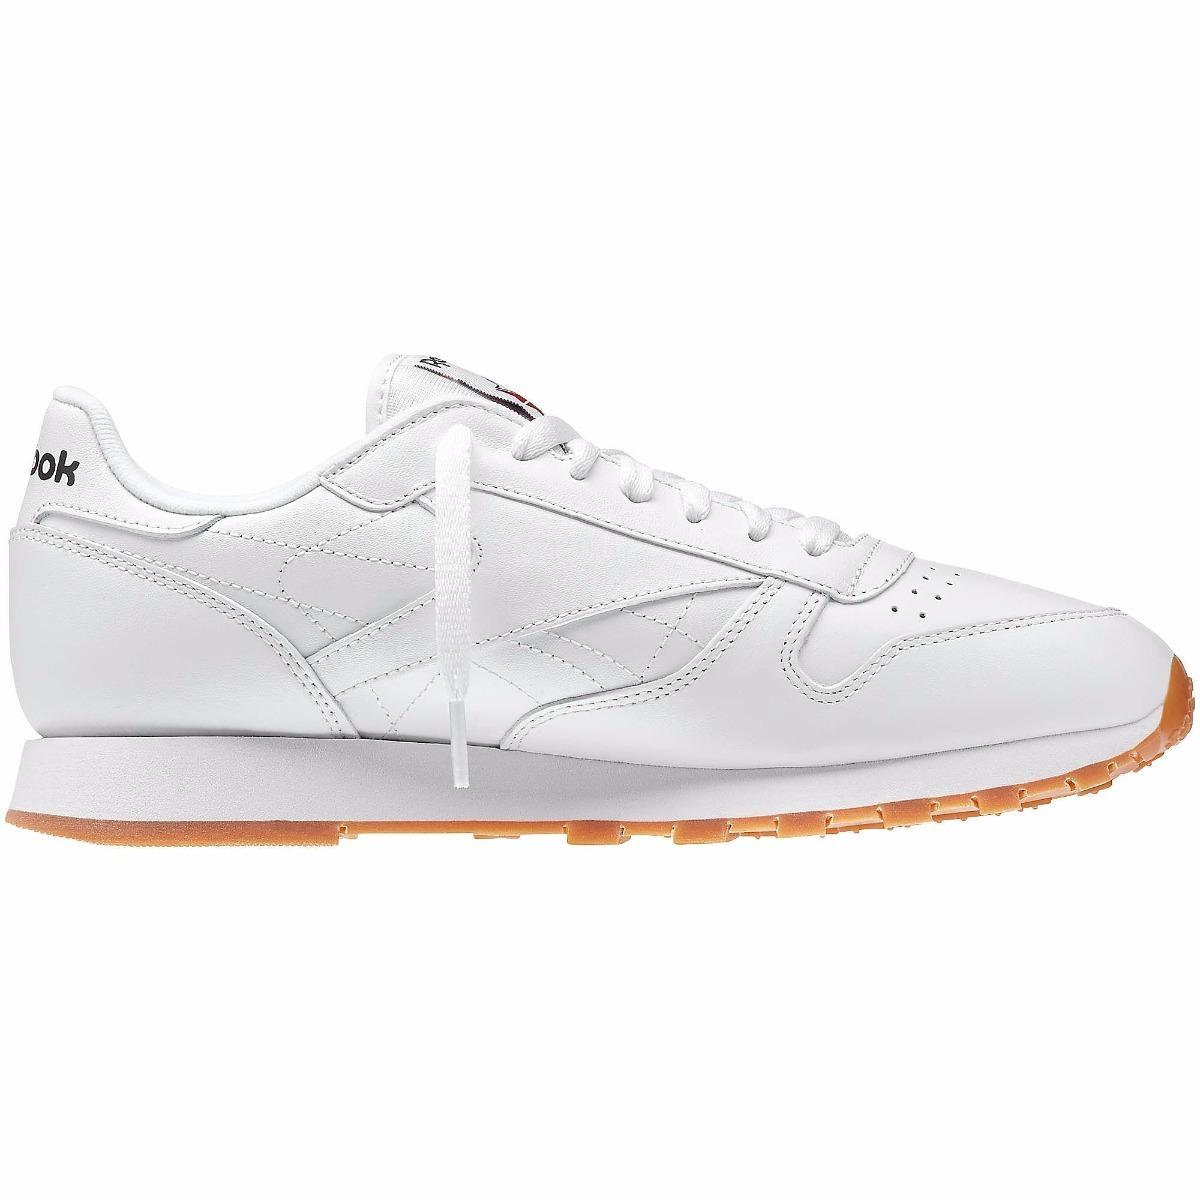 c8c374fc6821a tenis reebok classic leather blanco ¡envio gratis! Cargando zoom.